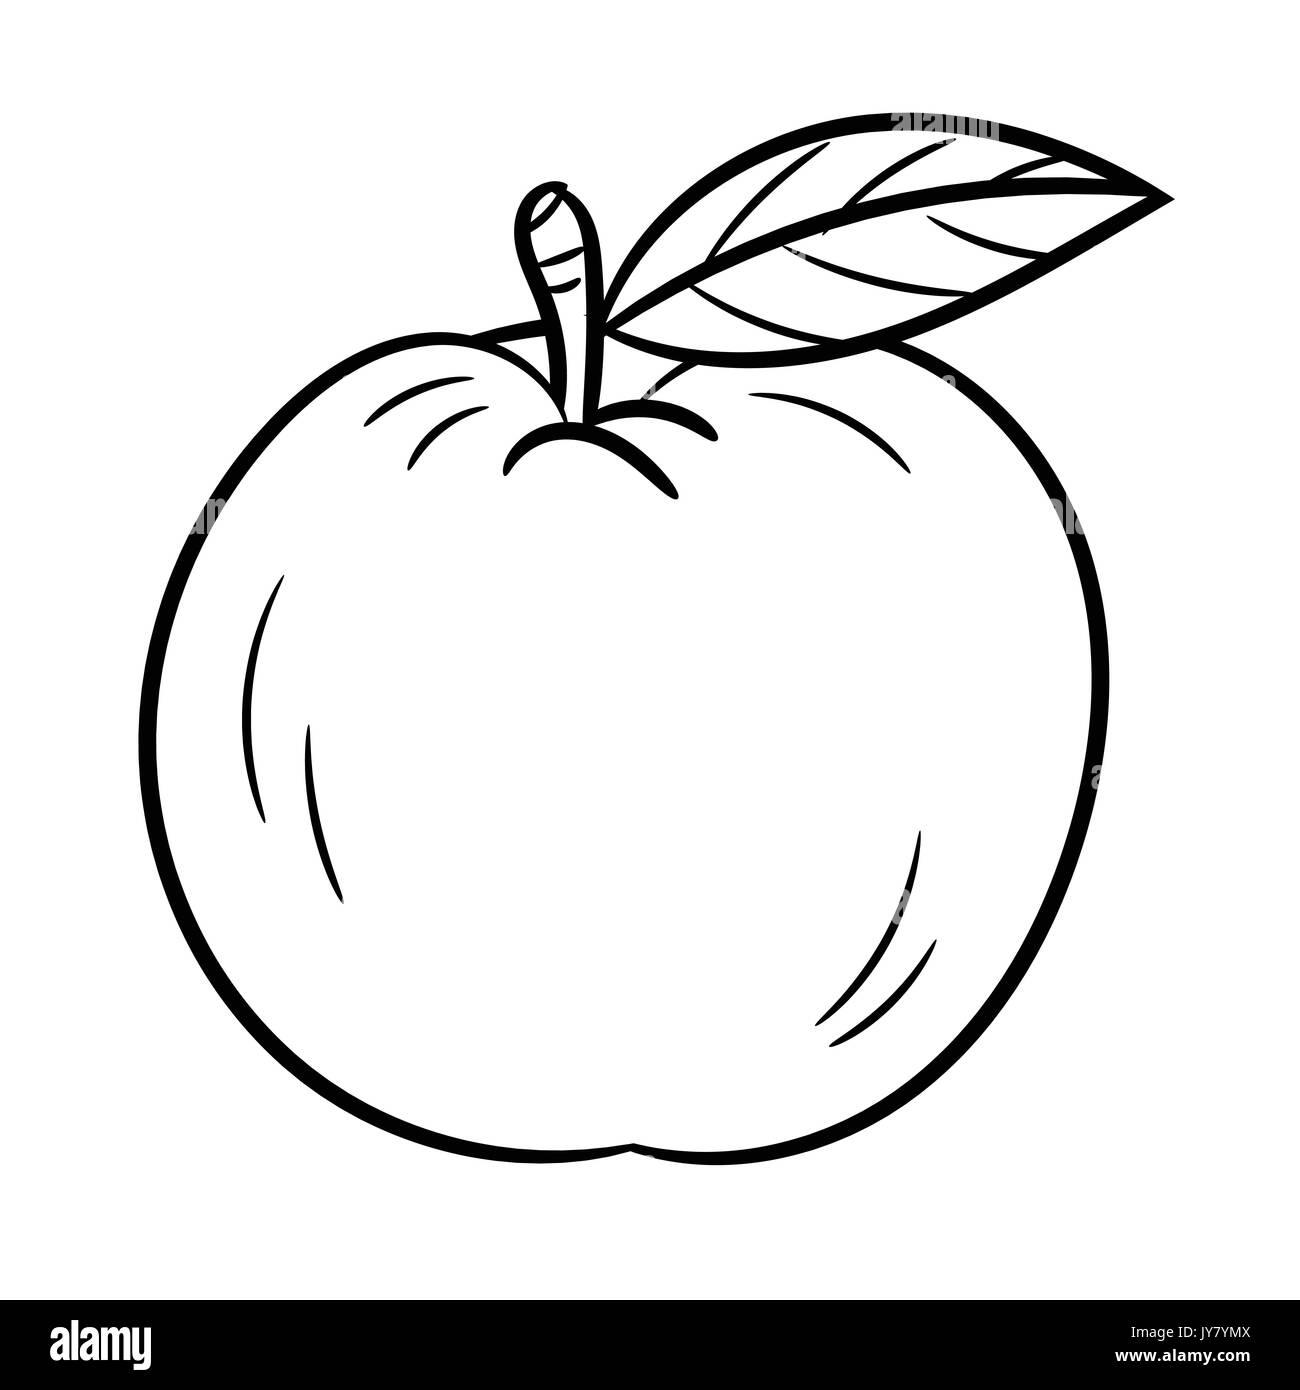 cartoon apple black and white stock photos u0026 images alamy